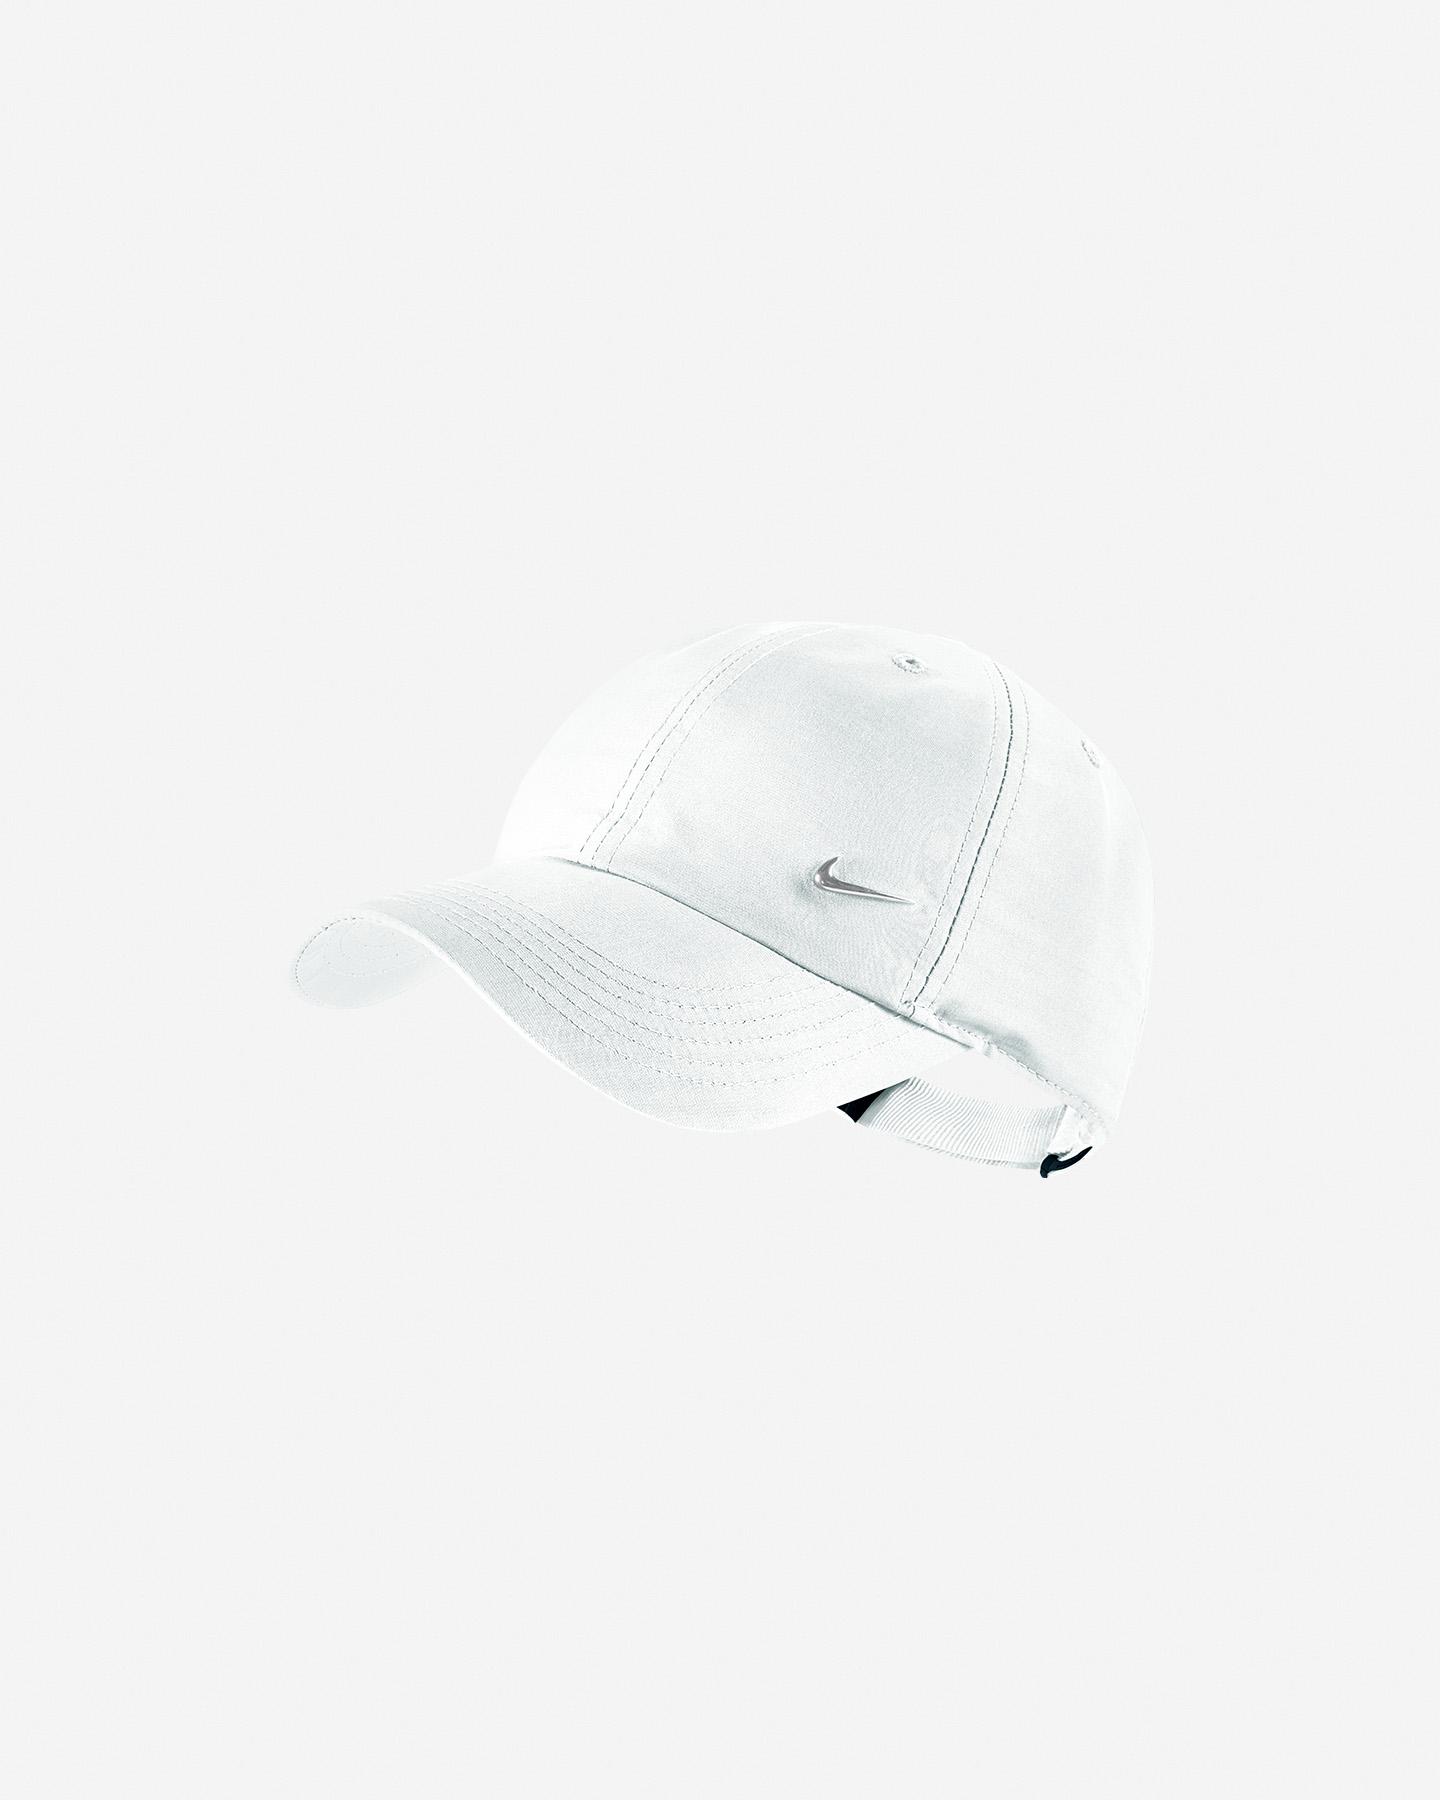 bf86ac486e Cappellino NIKE SWOOSH JR Cappellino NIKE SWOOSH JR. Nike cappellino con  visiera ...